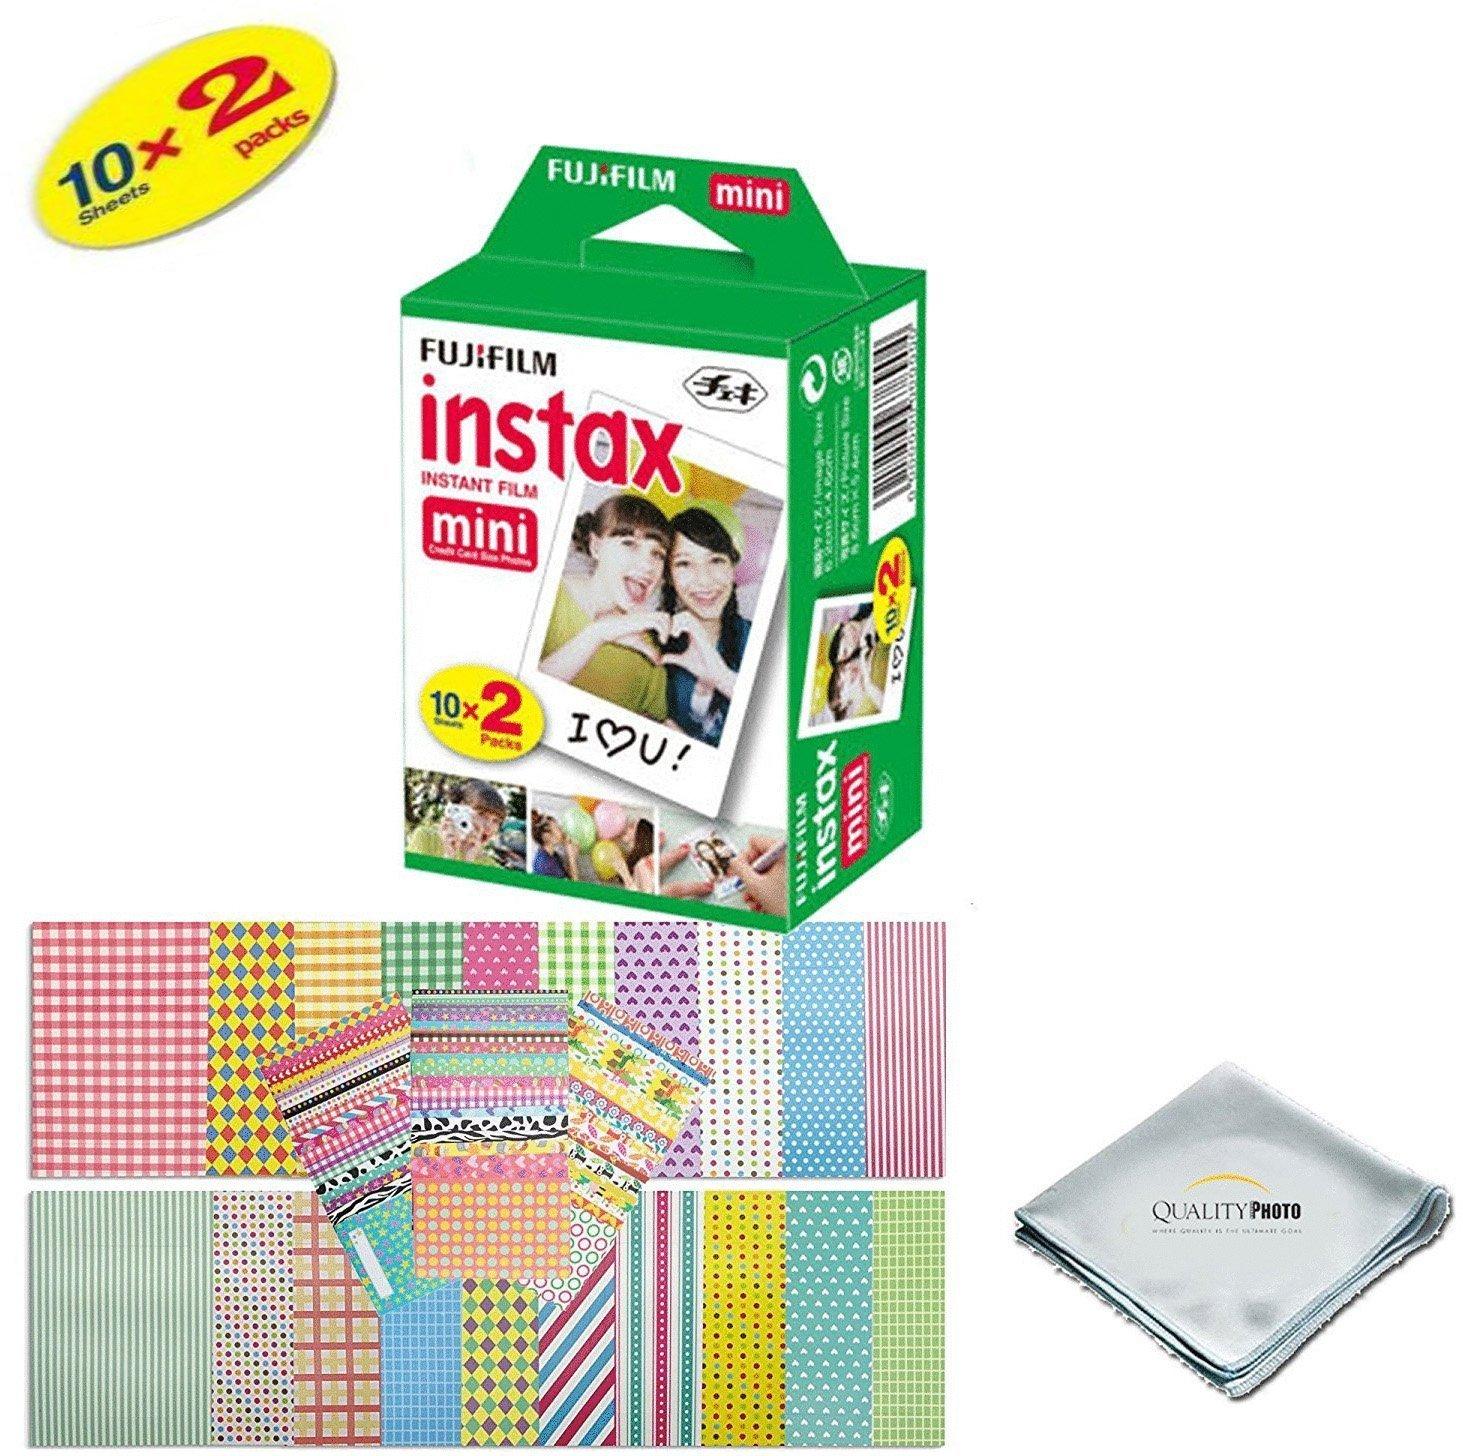 Fujifilm Instax Mini 9 Instant Camera - SMOKEY WHITE + Fuji INSTAX Film (20 Exposures) + Multifarious Instax Accessory Kit BUNDLE Includes; Case/Strap & Album + Fun Frames/Stickers/Lenses + MORE